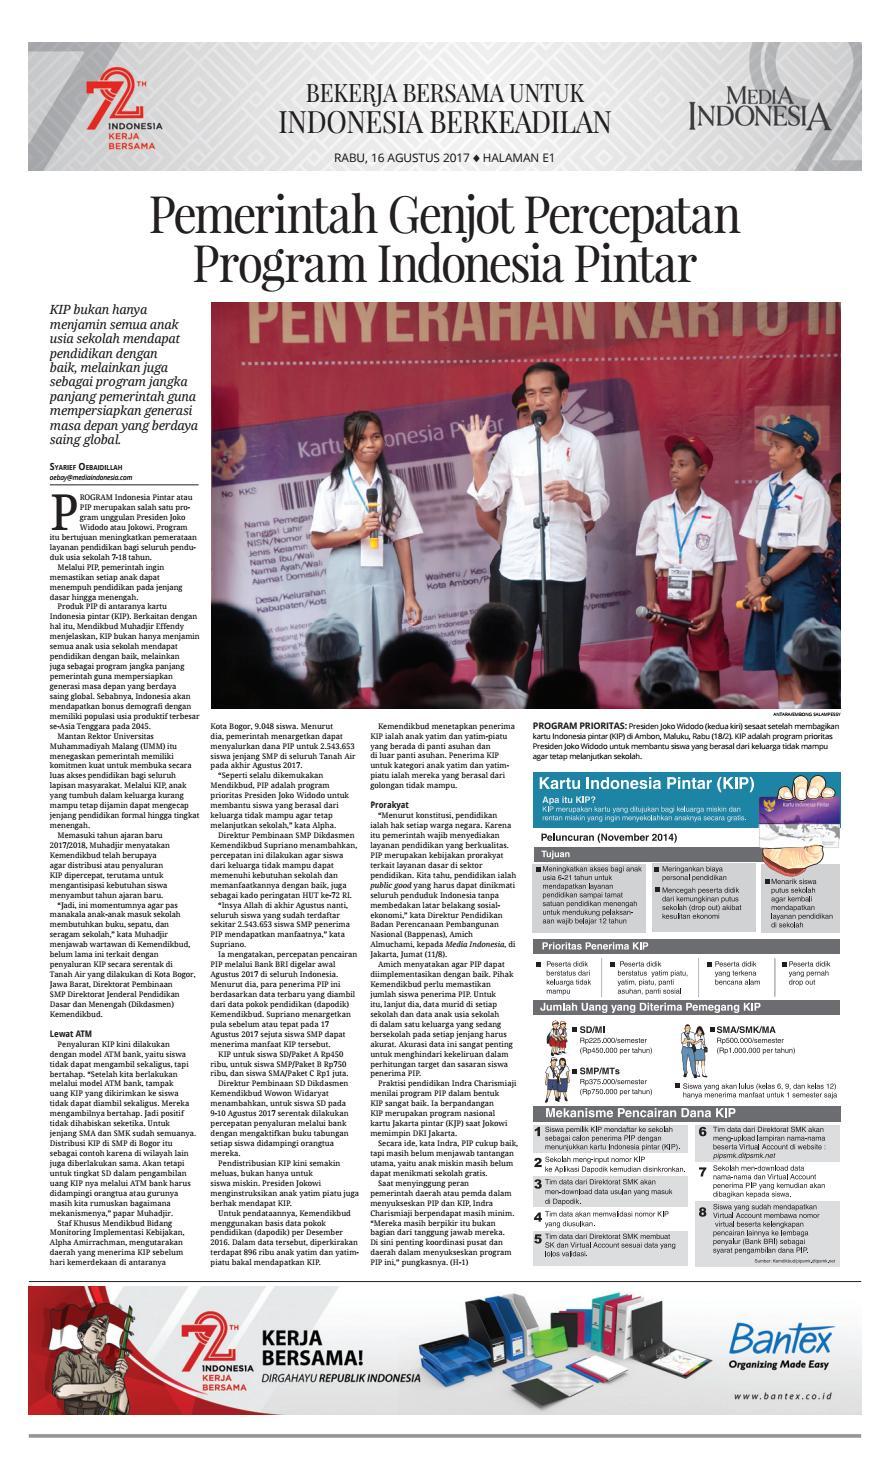 Media Indonesia 16 08 2017 16082017030805 By Oppah Issuu E5673 Tsel Ramadhan Fair Asia Plaza Tasikmalaya